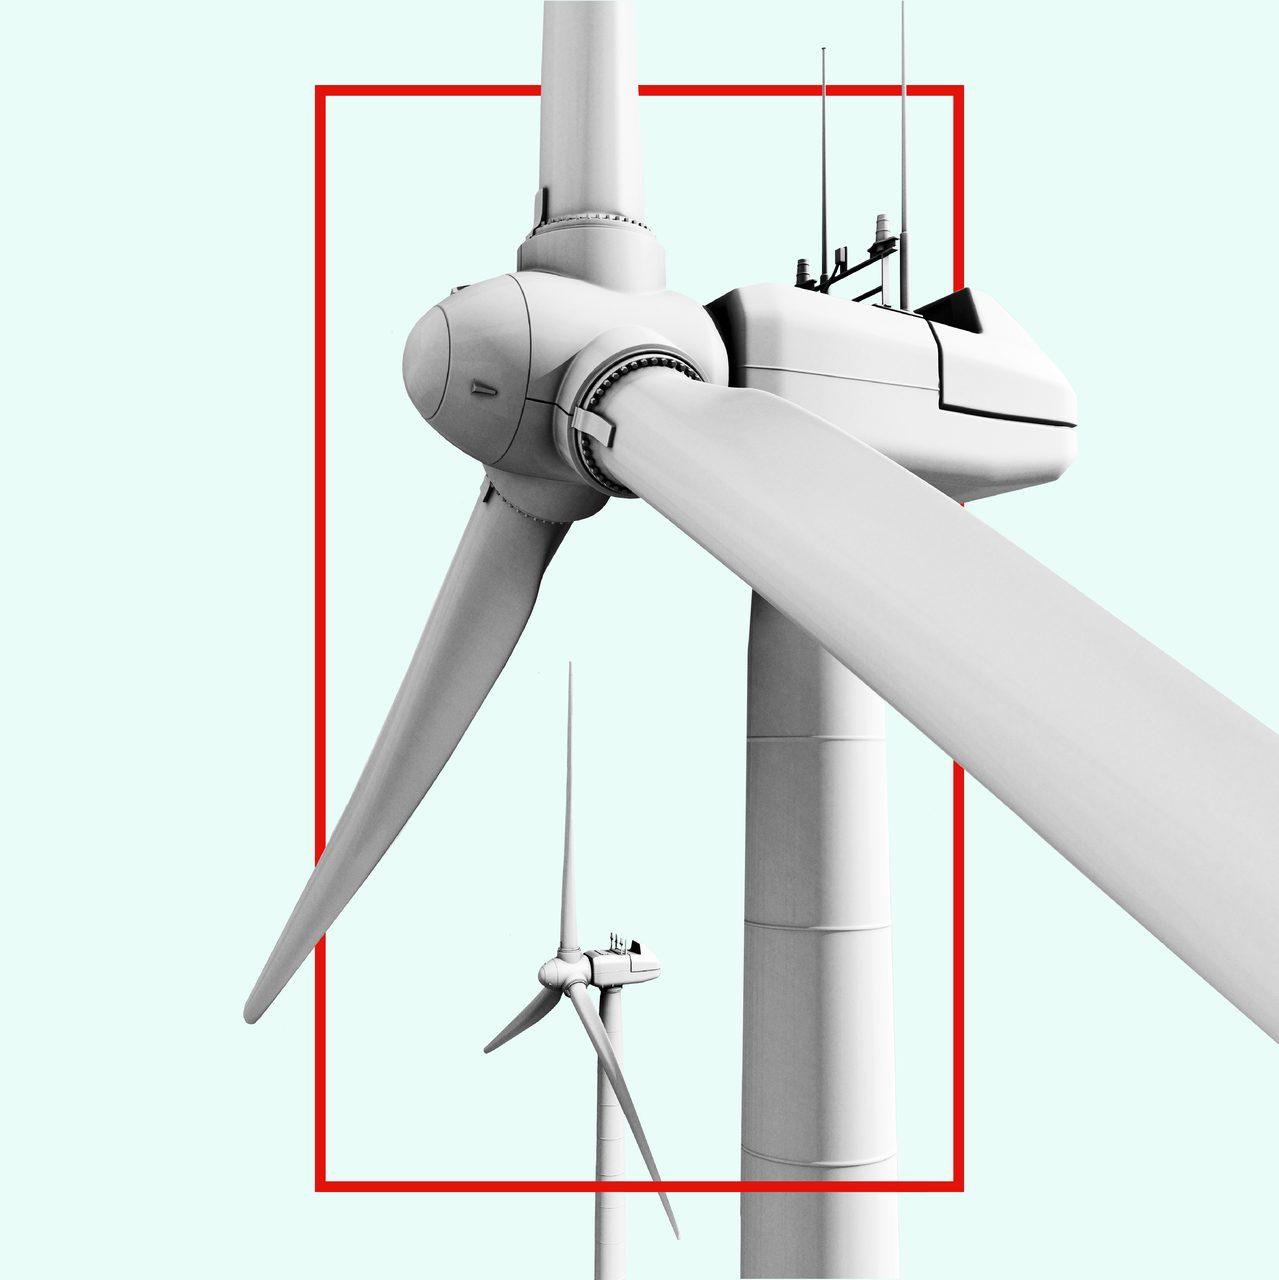 Wind turbine, White, Windmill, Aircraft, Line, Propeller